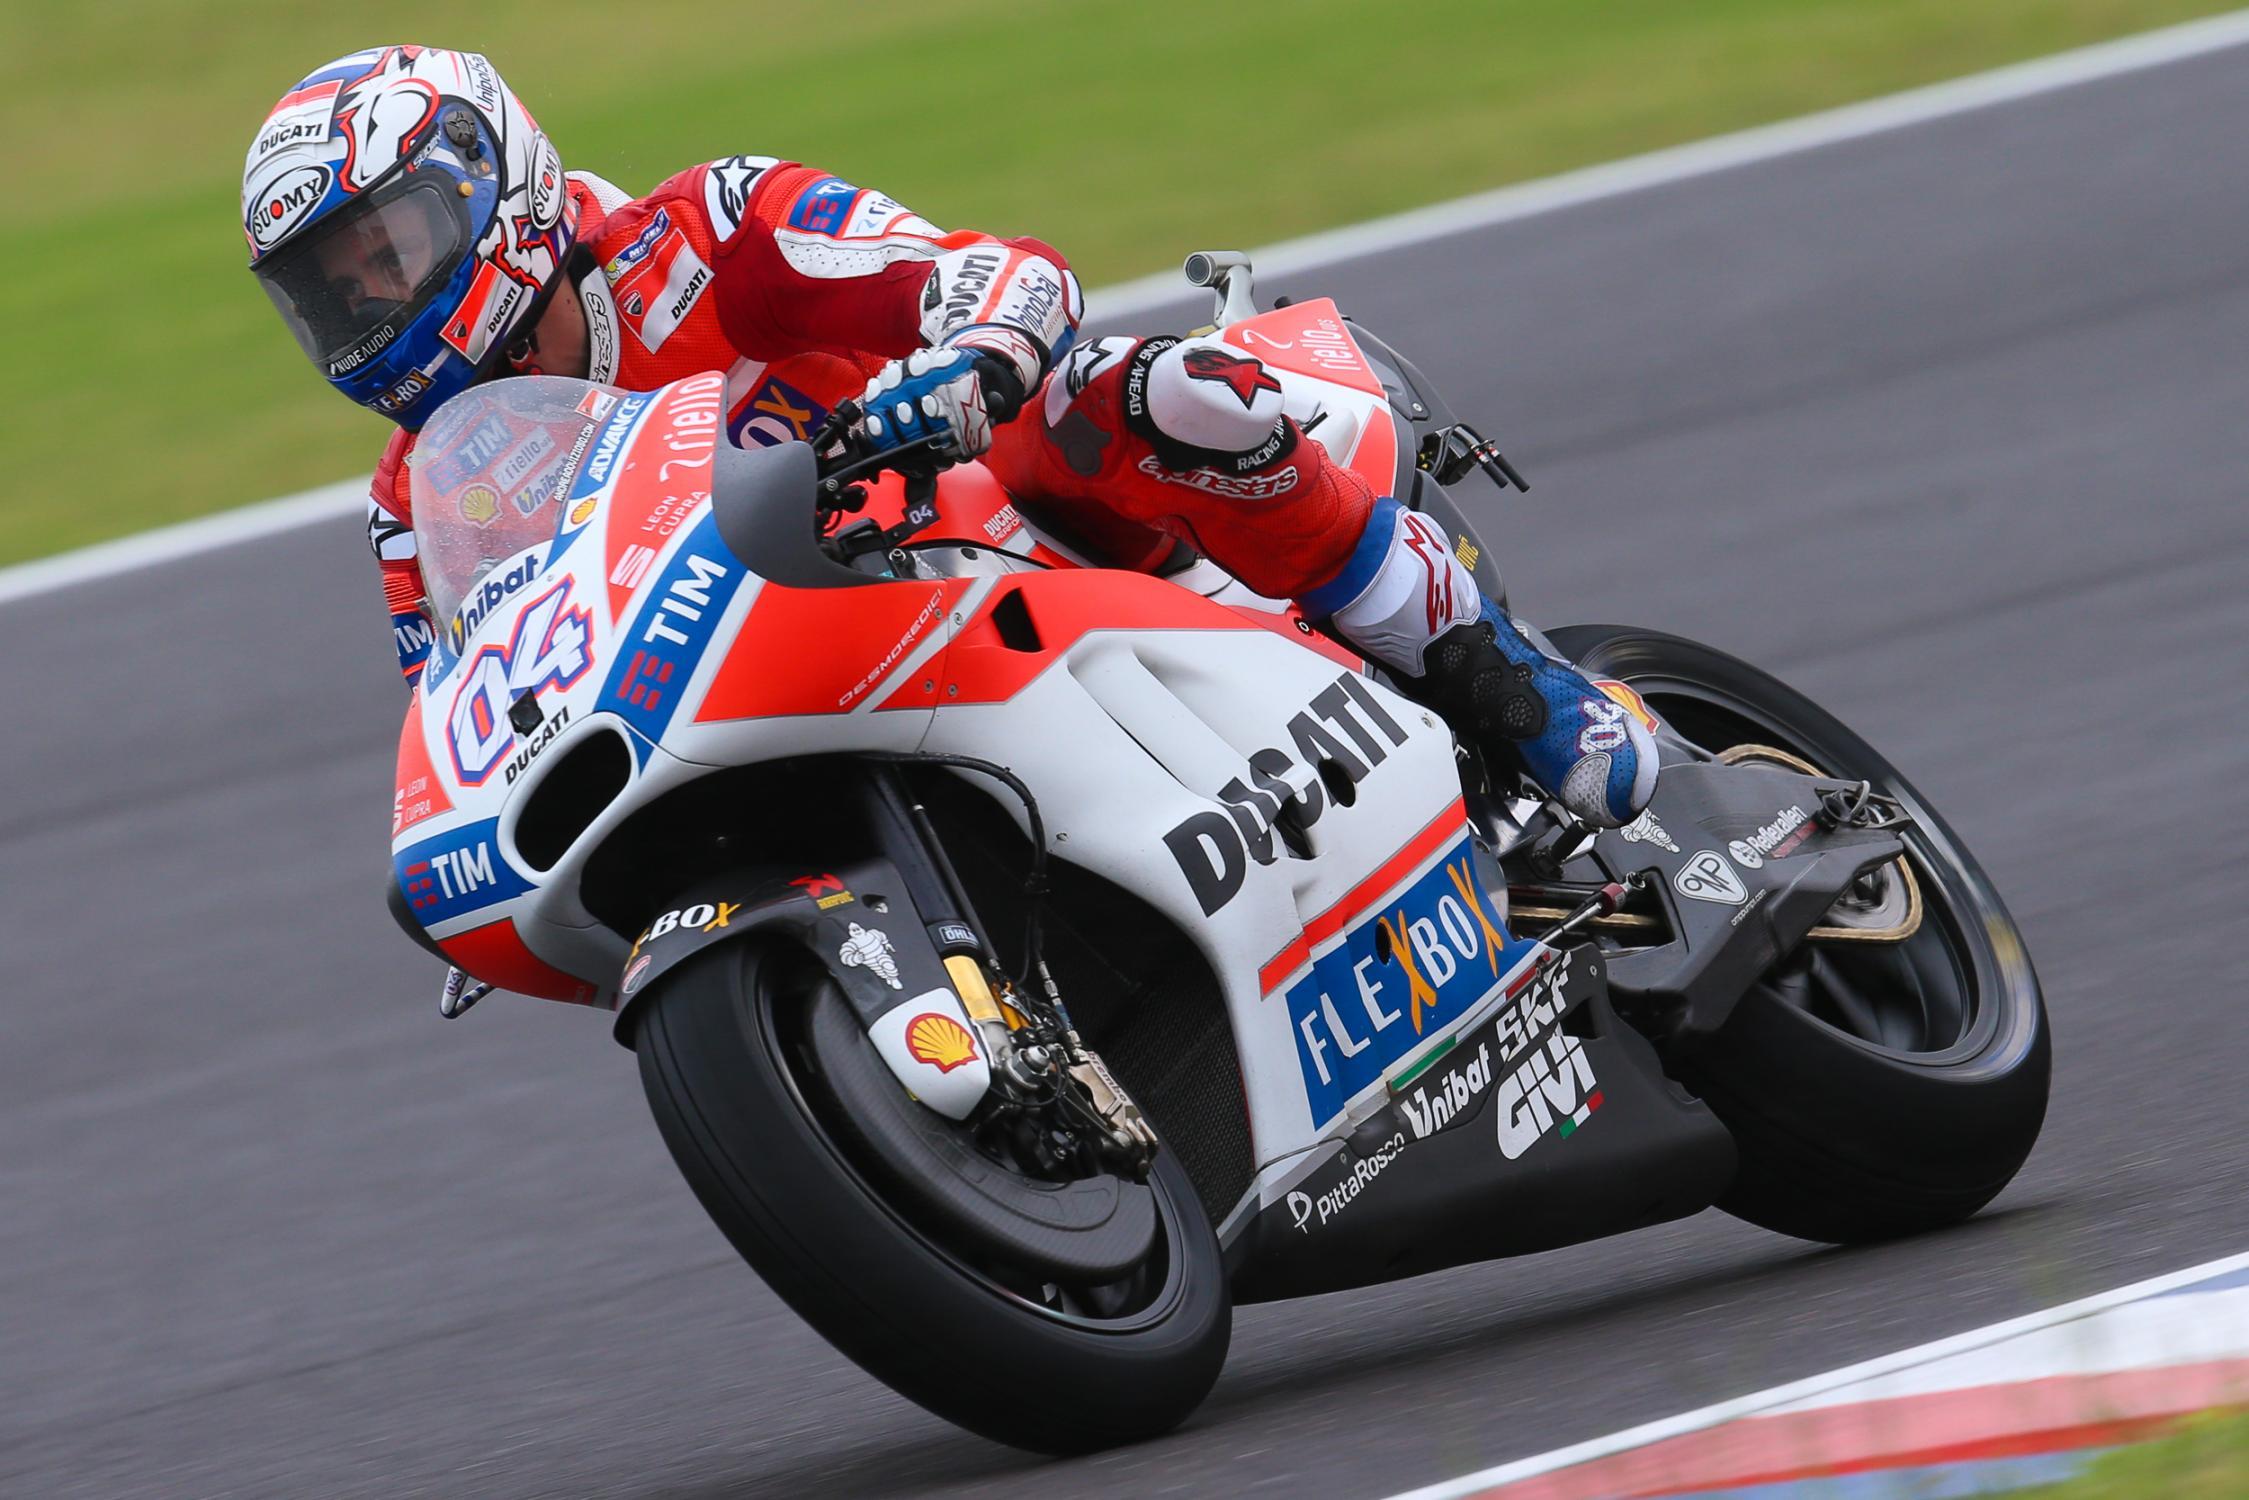 [MotoGP] Argentine 04-andrea-dovizioso-itabl1_1358.gallery_full_top_fullscreen